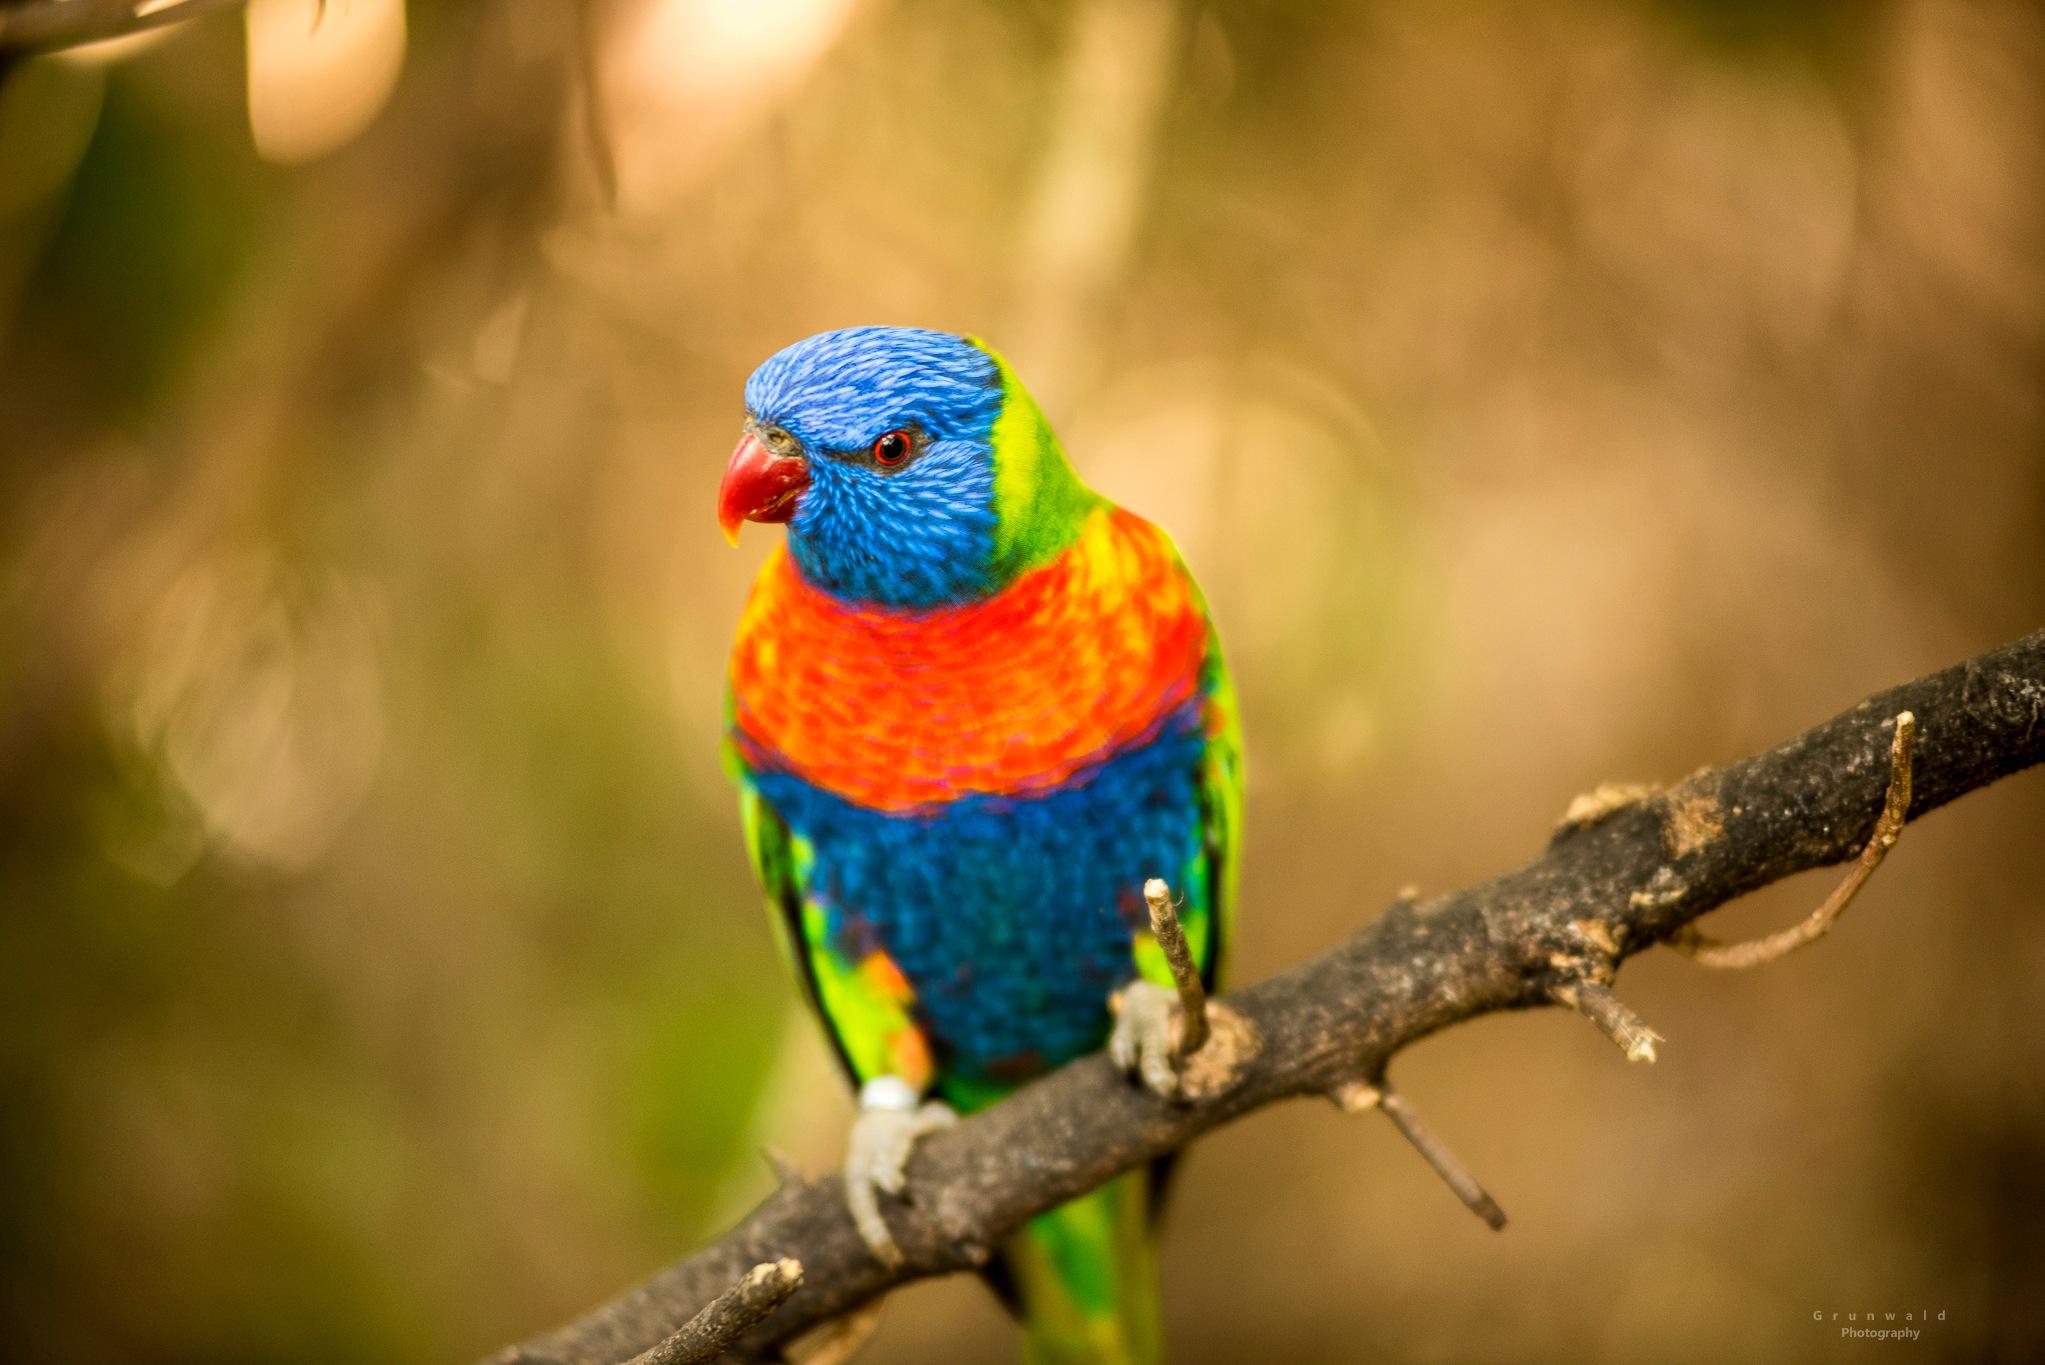 bird by PawelGrunwald